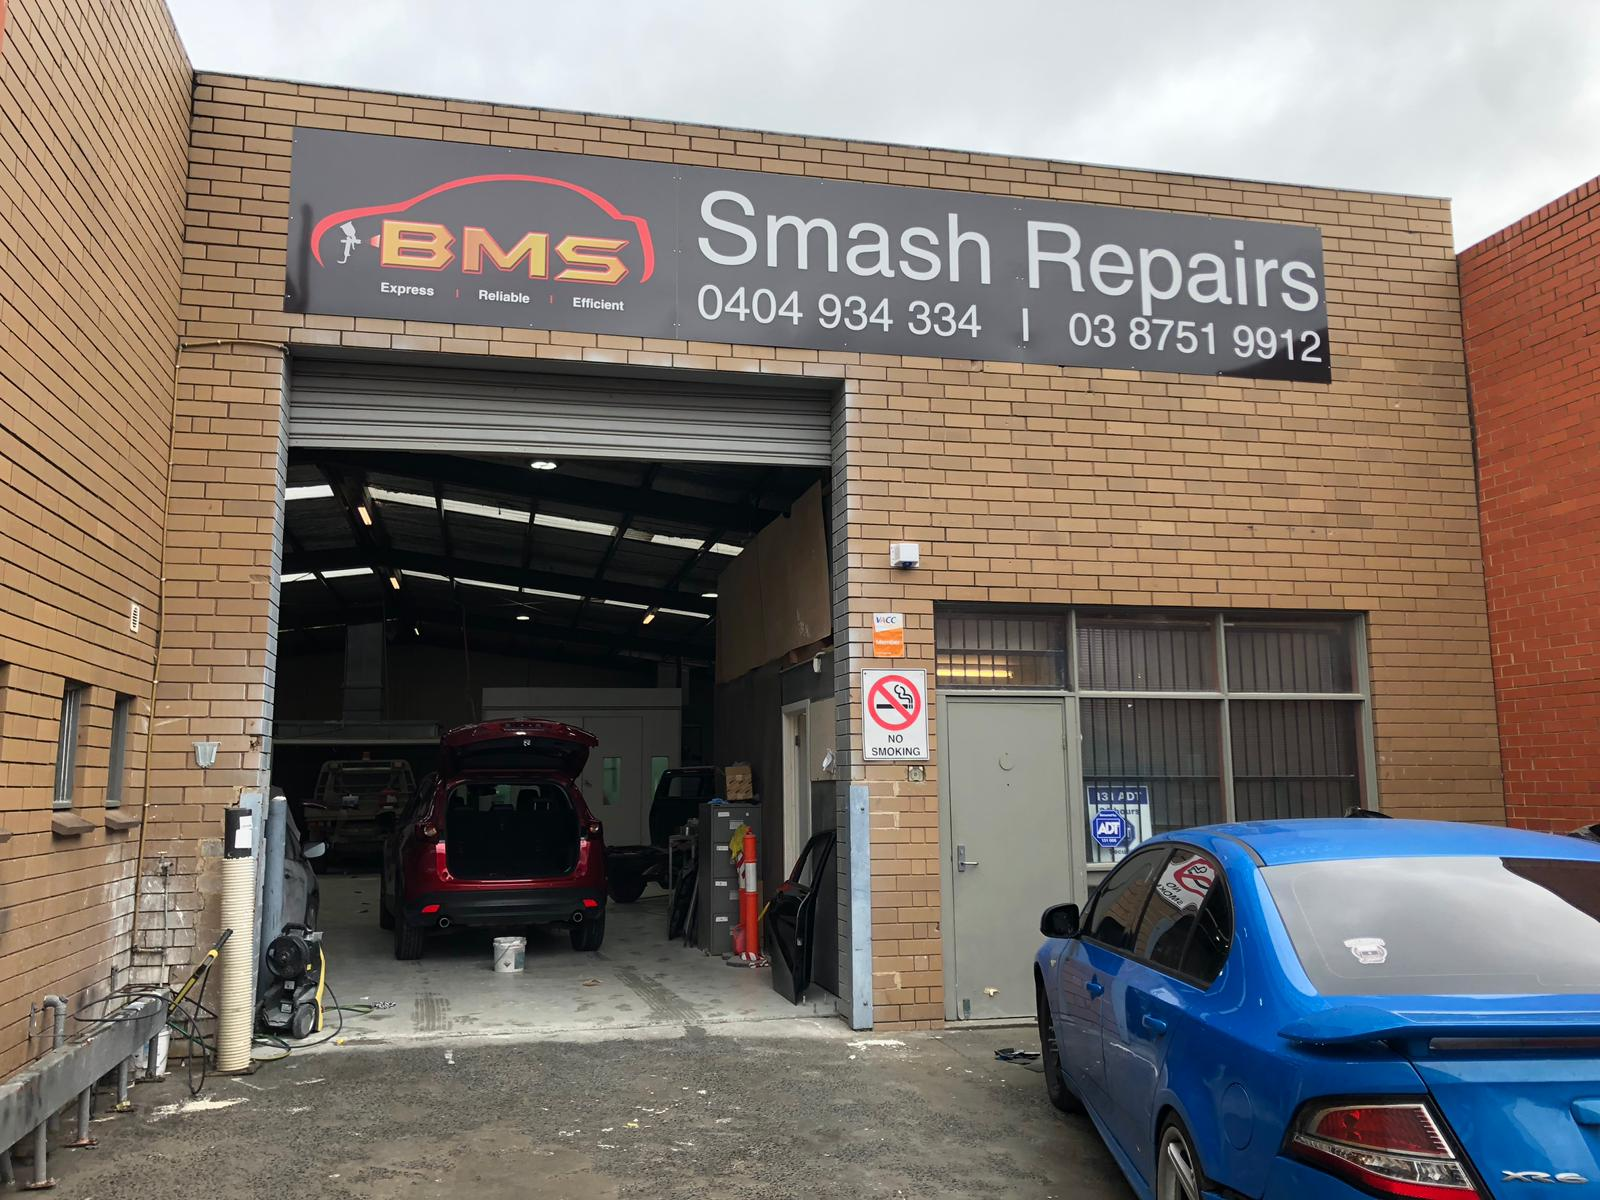 BMS Smash Repairs Photos